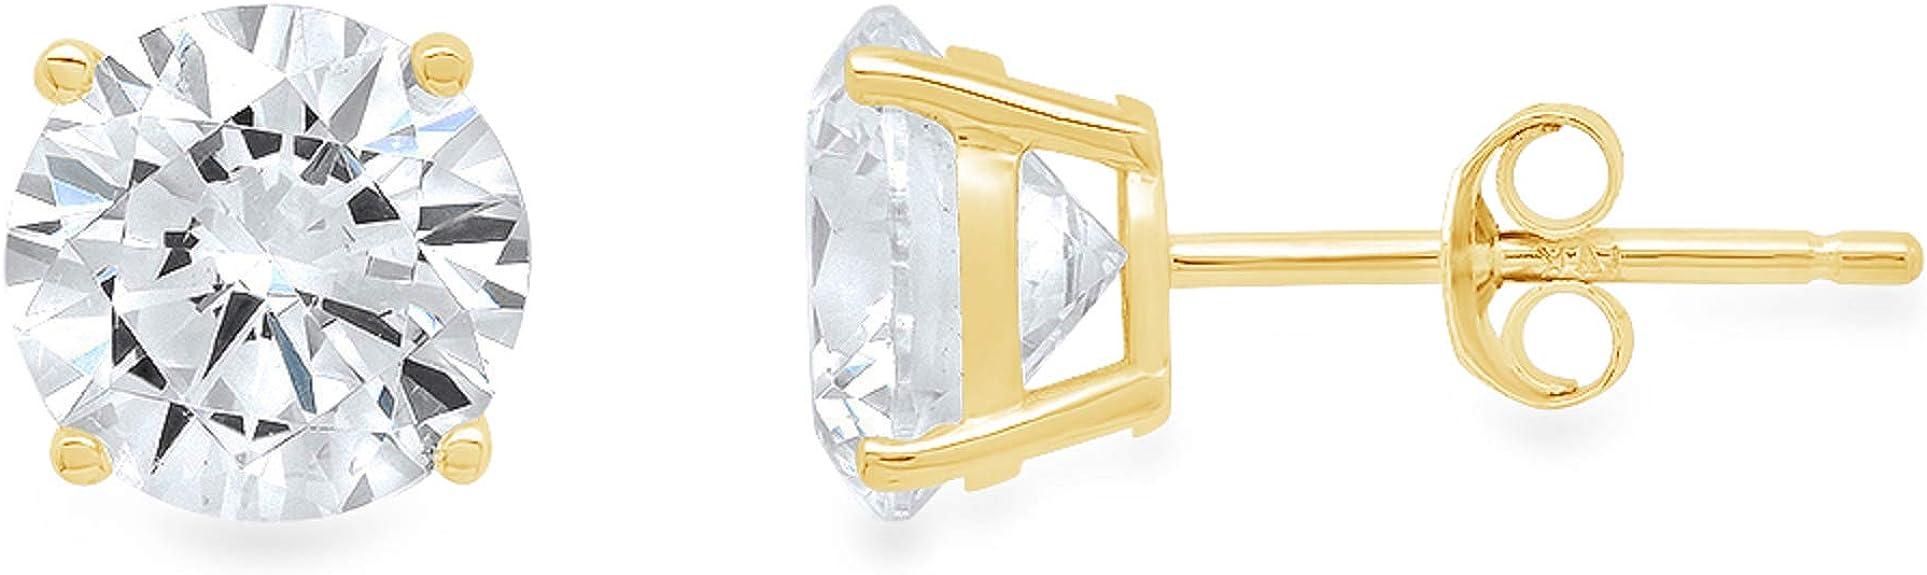 4101 0.90 cttw \u2022 Brilliant Hoop Earrings \u2022 Brilliant Cut Diamond Simulant \u2022 All Around Stones Prong Set Earring \u2022 Bridal Earrings